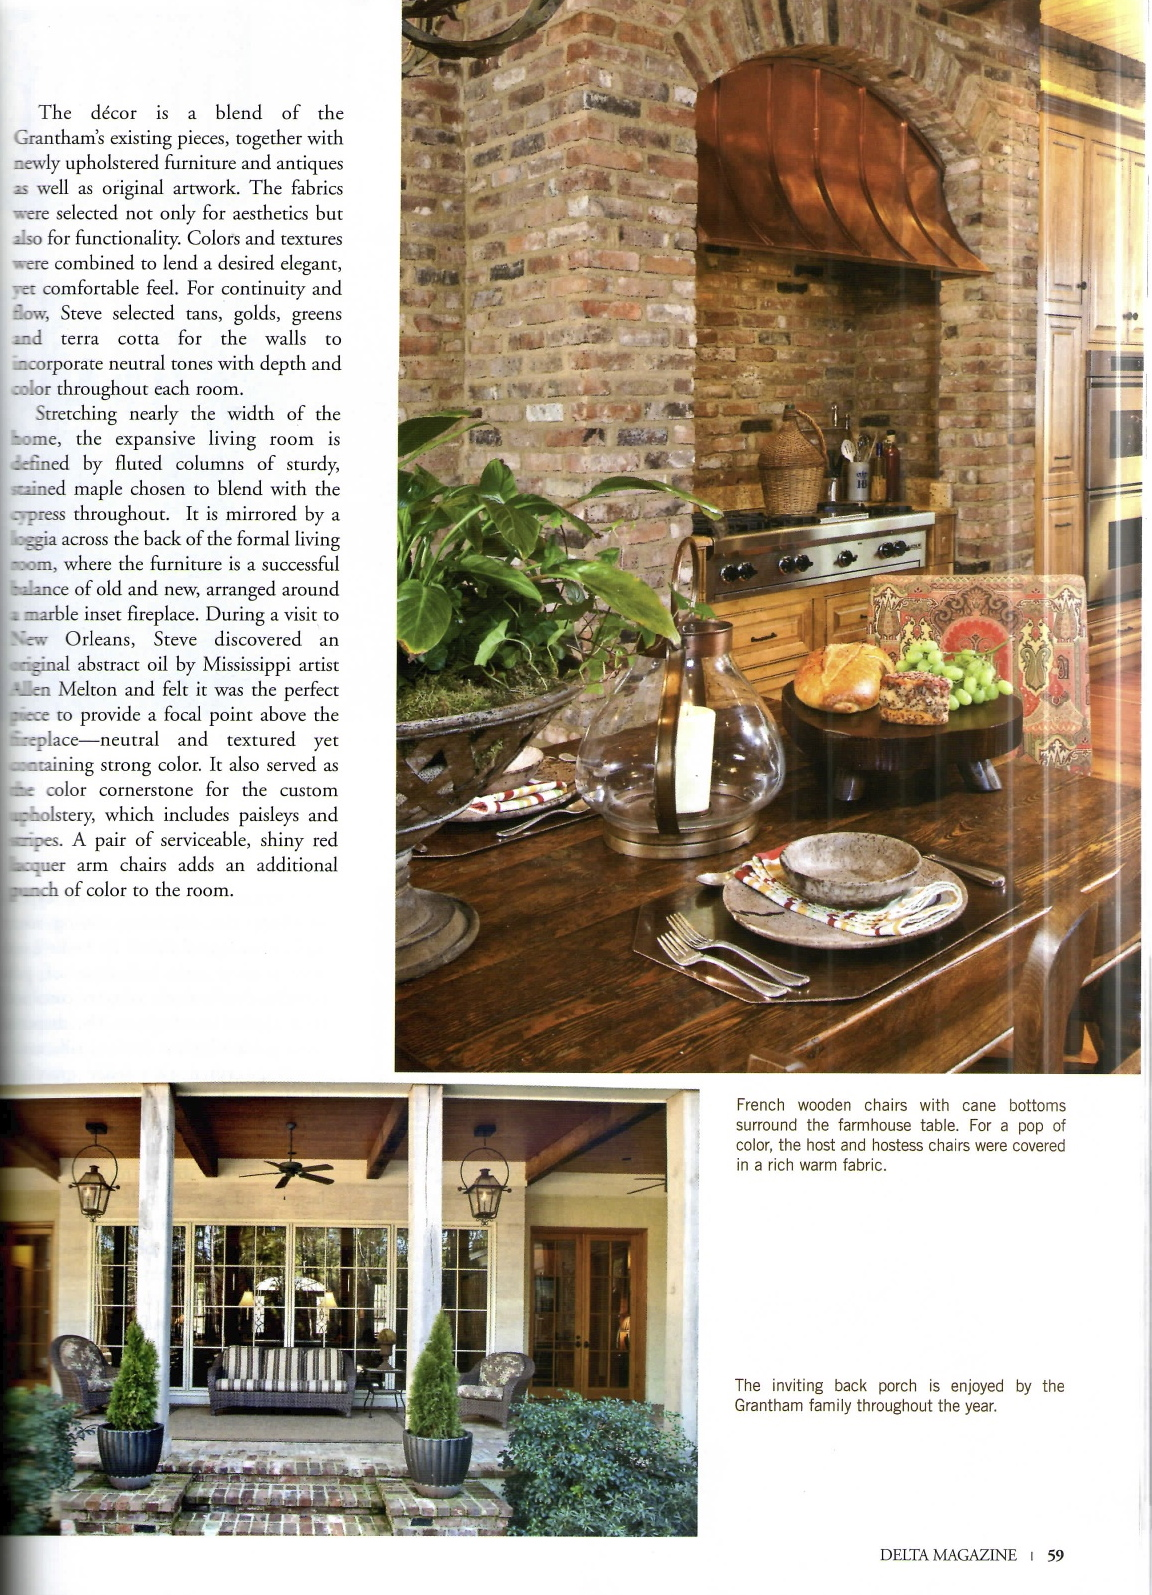 Grantham article - Delta Magazine -March April 2011 6.jpeg